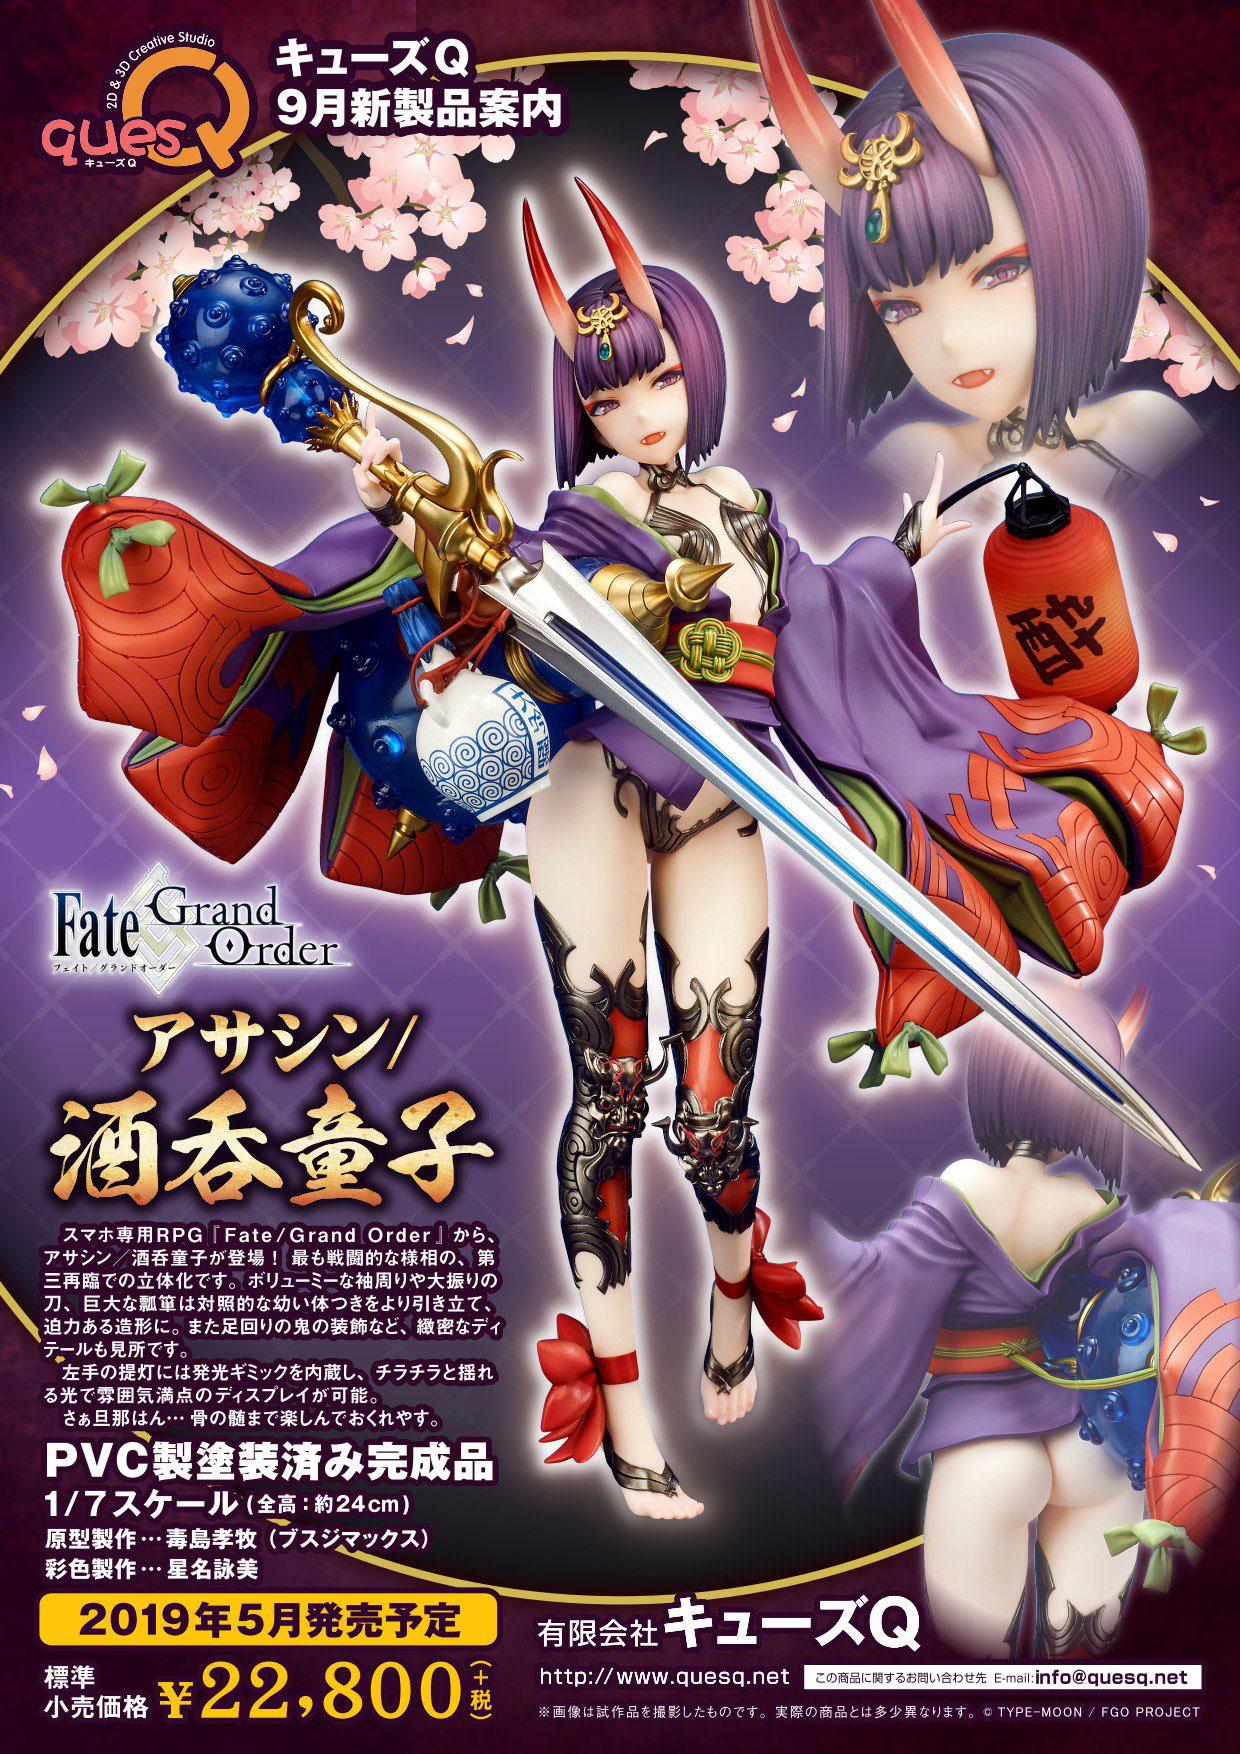 Fate-Grand-Order-Shuten-Douji-QuesQ-Ad-01